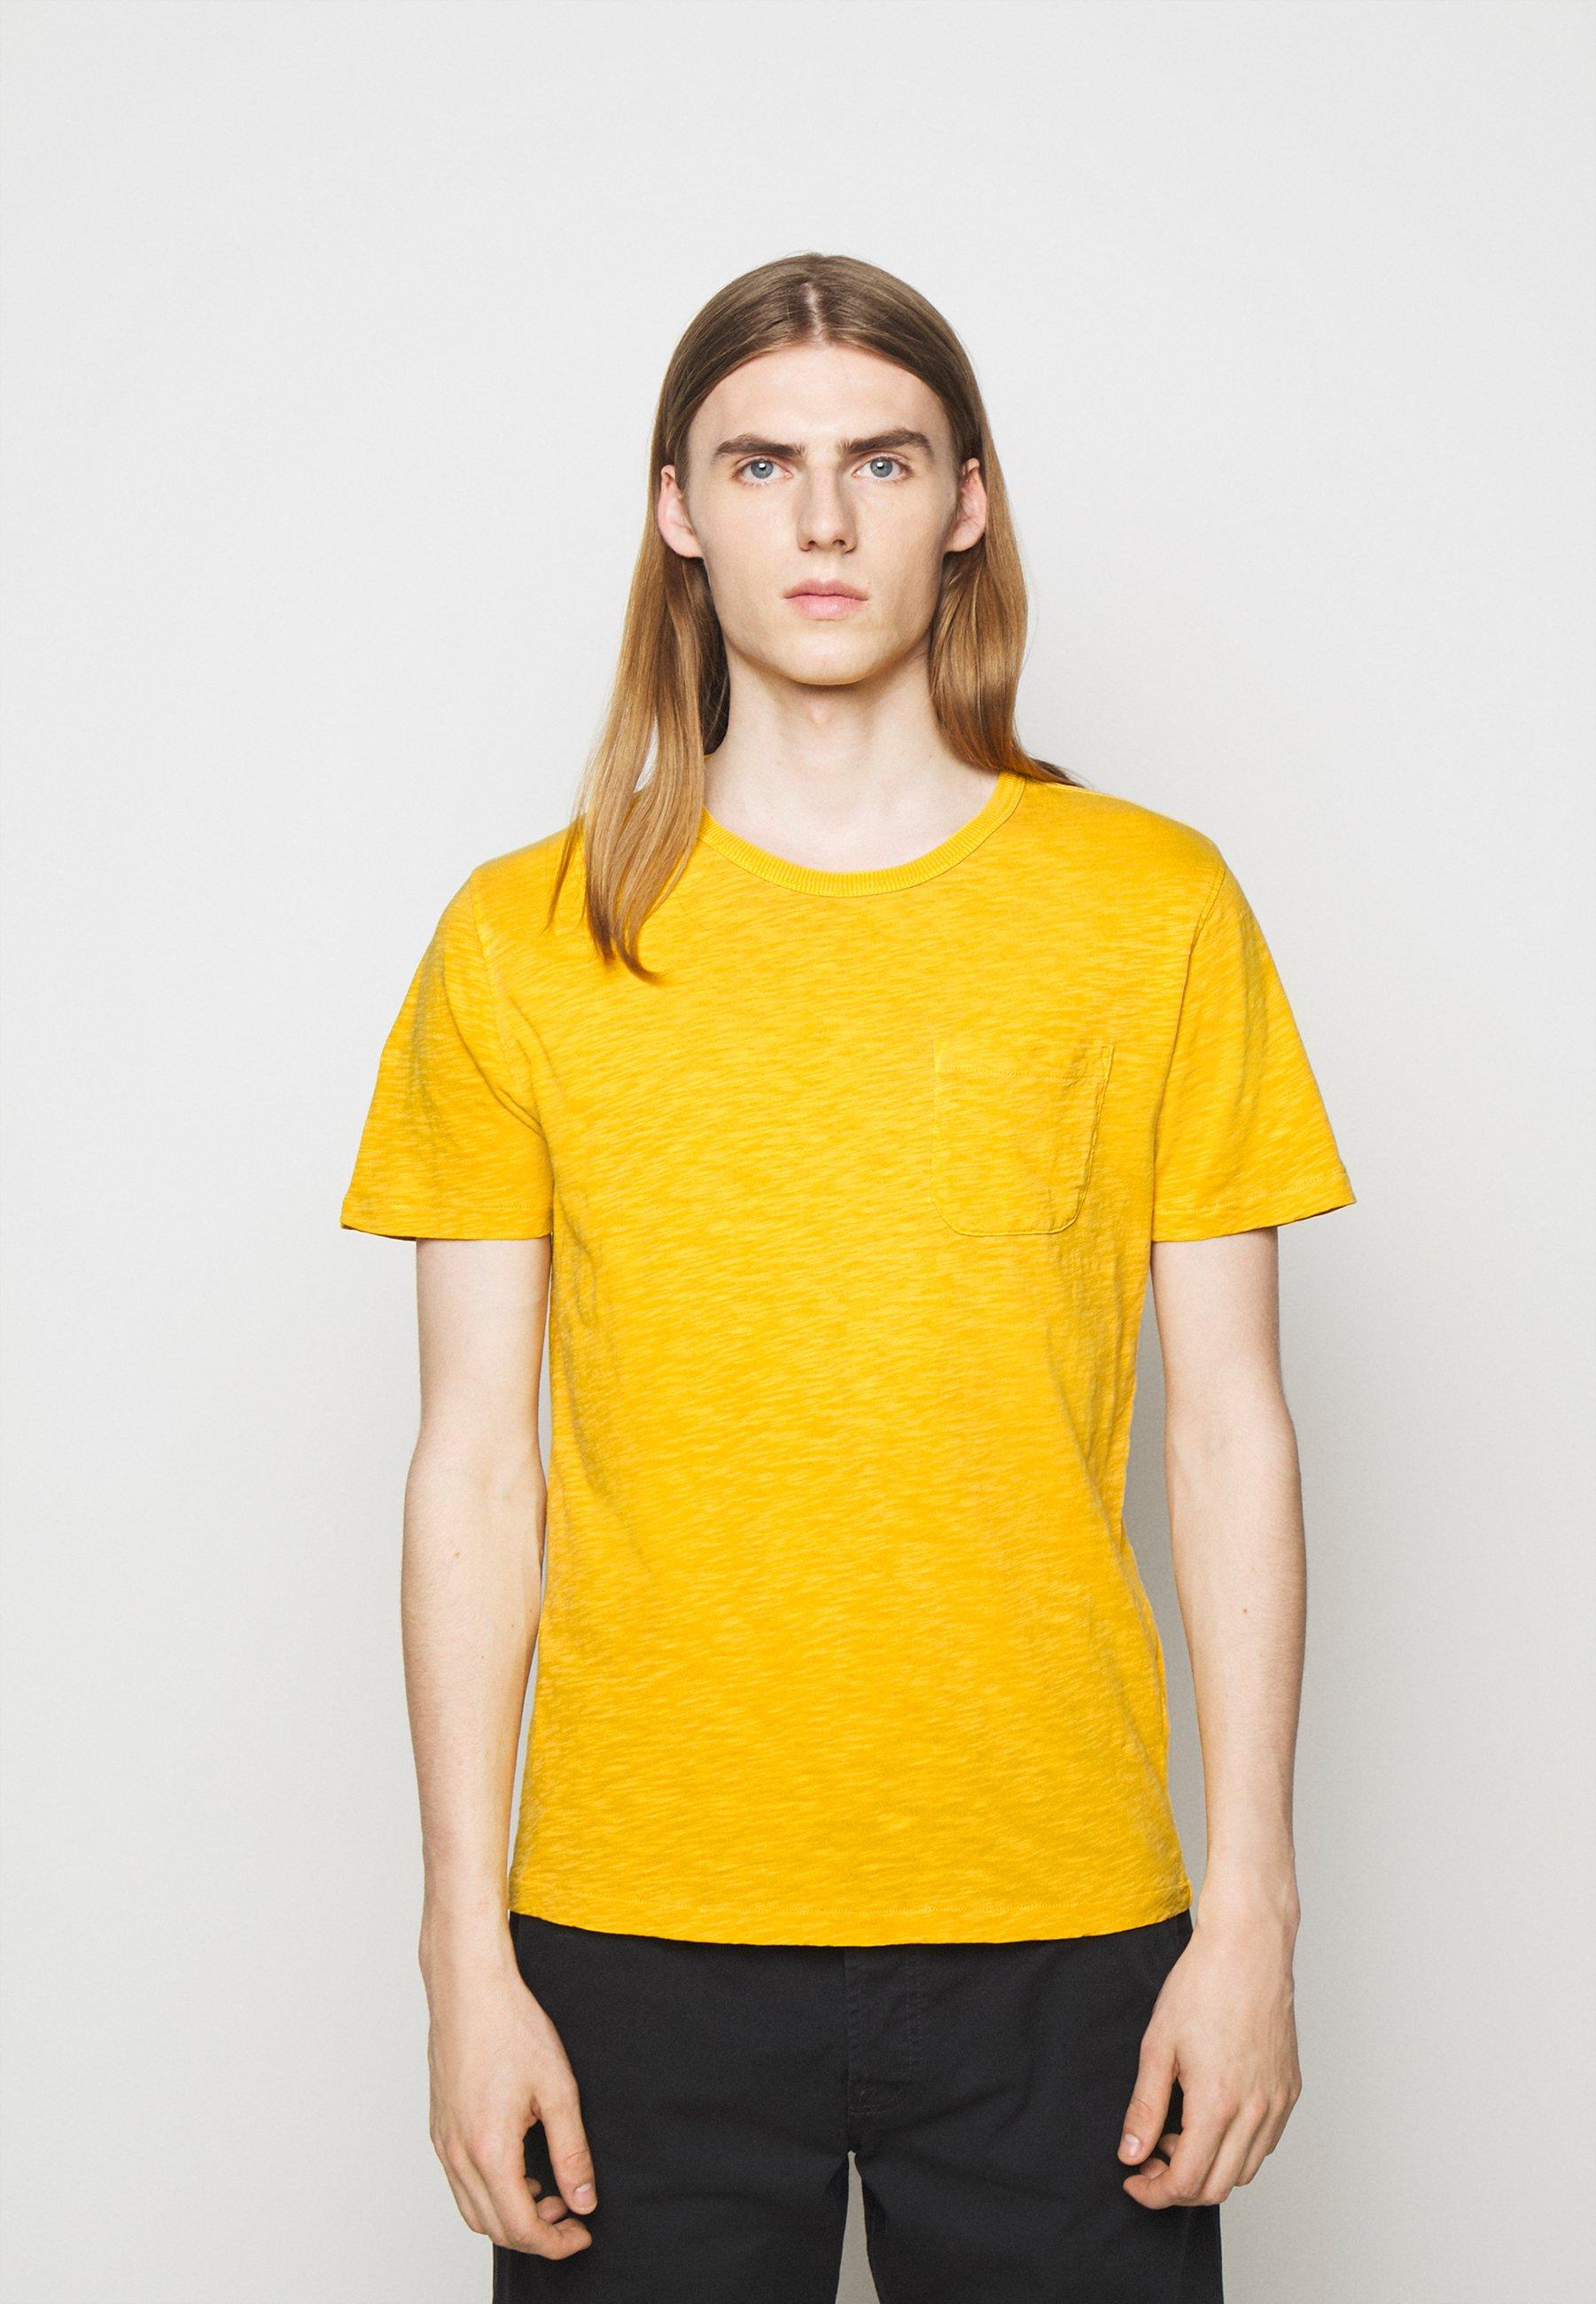 Homme WILD ONES POCKET - T-shirt basique